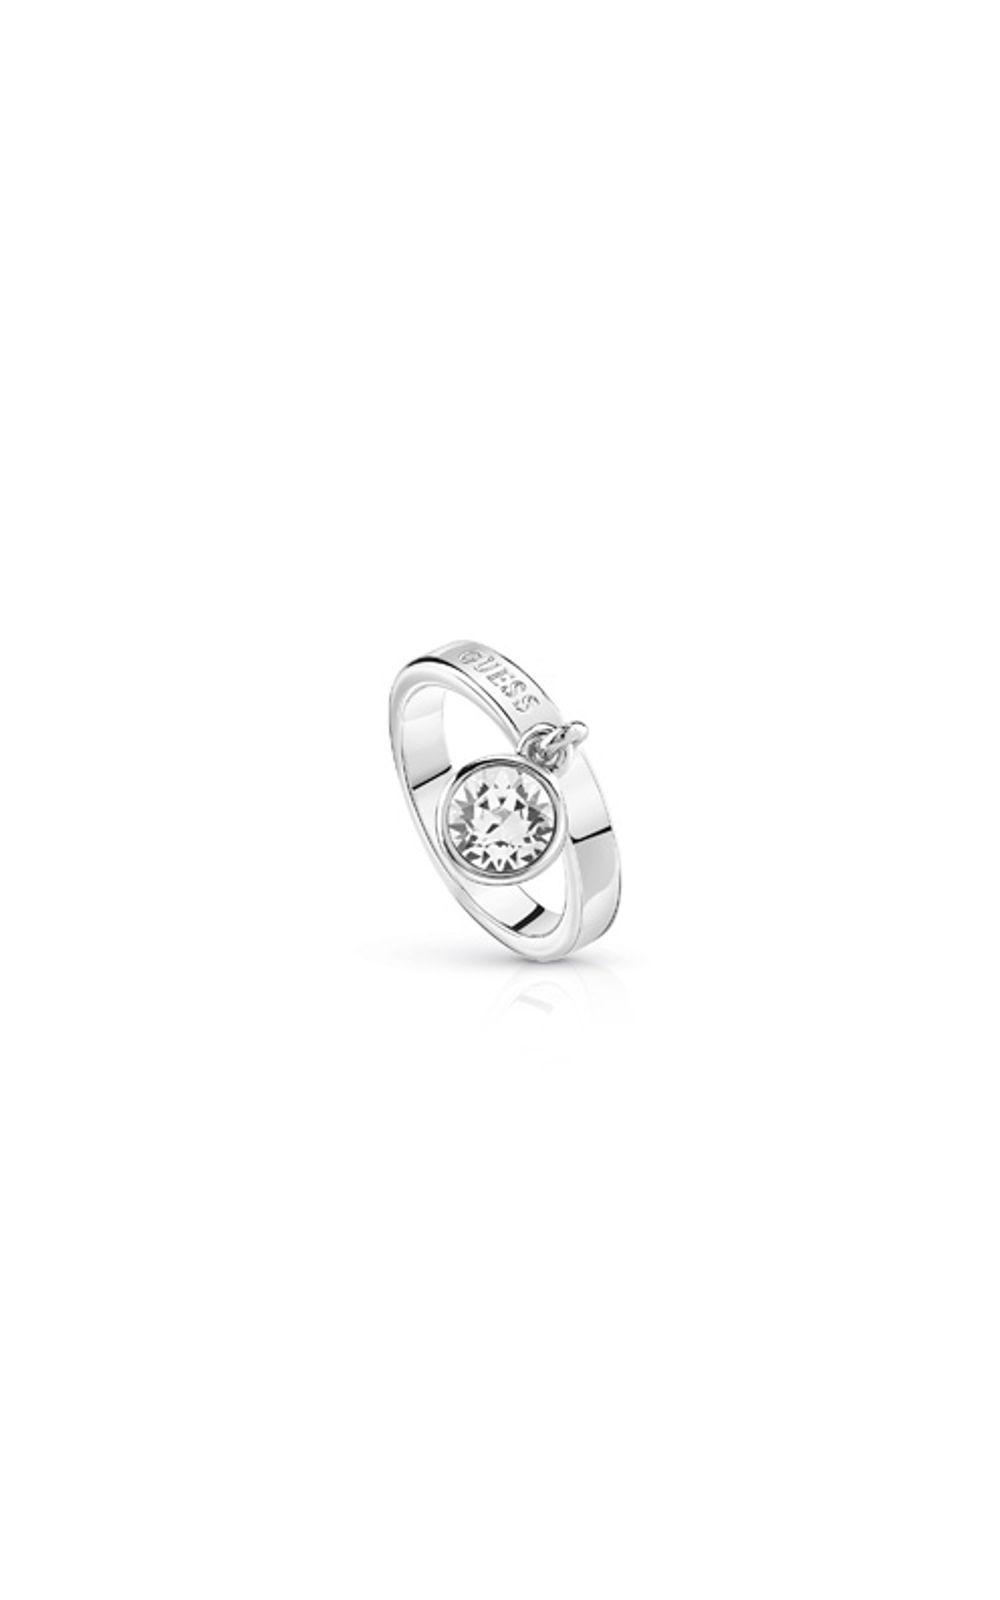 GUESS FAUX UBR84022-54 Ασημένιο Δαχτυλίδι Με Πέτρα